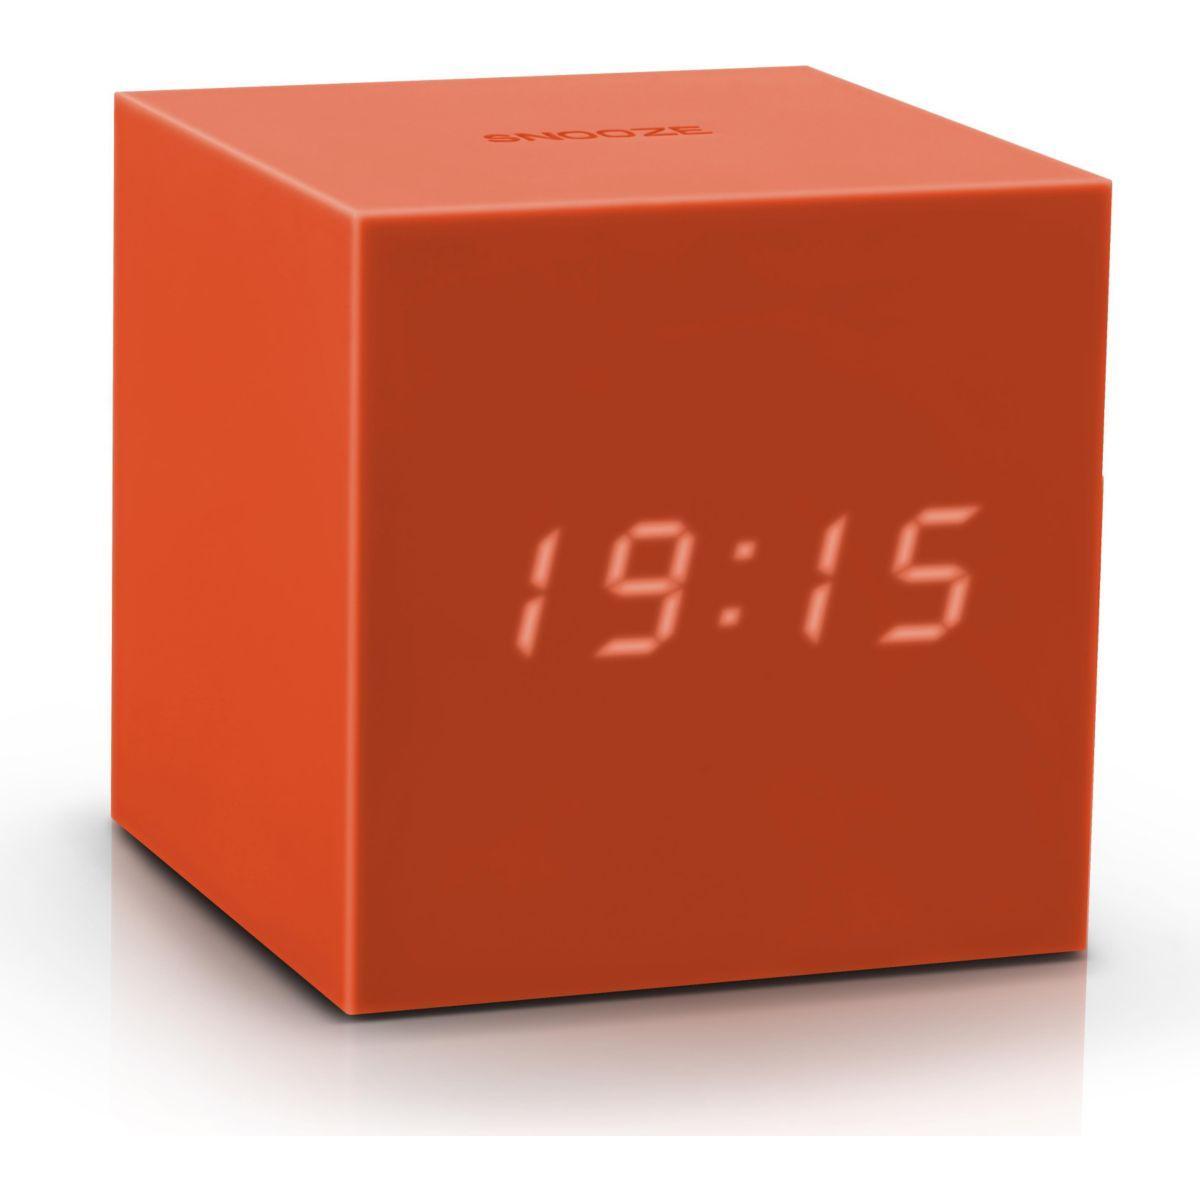 Réveil gingko gravity cube click clock o - 7% de remise immédiate avec le code : multi7